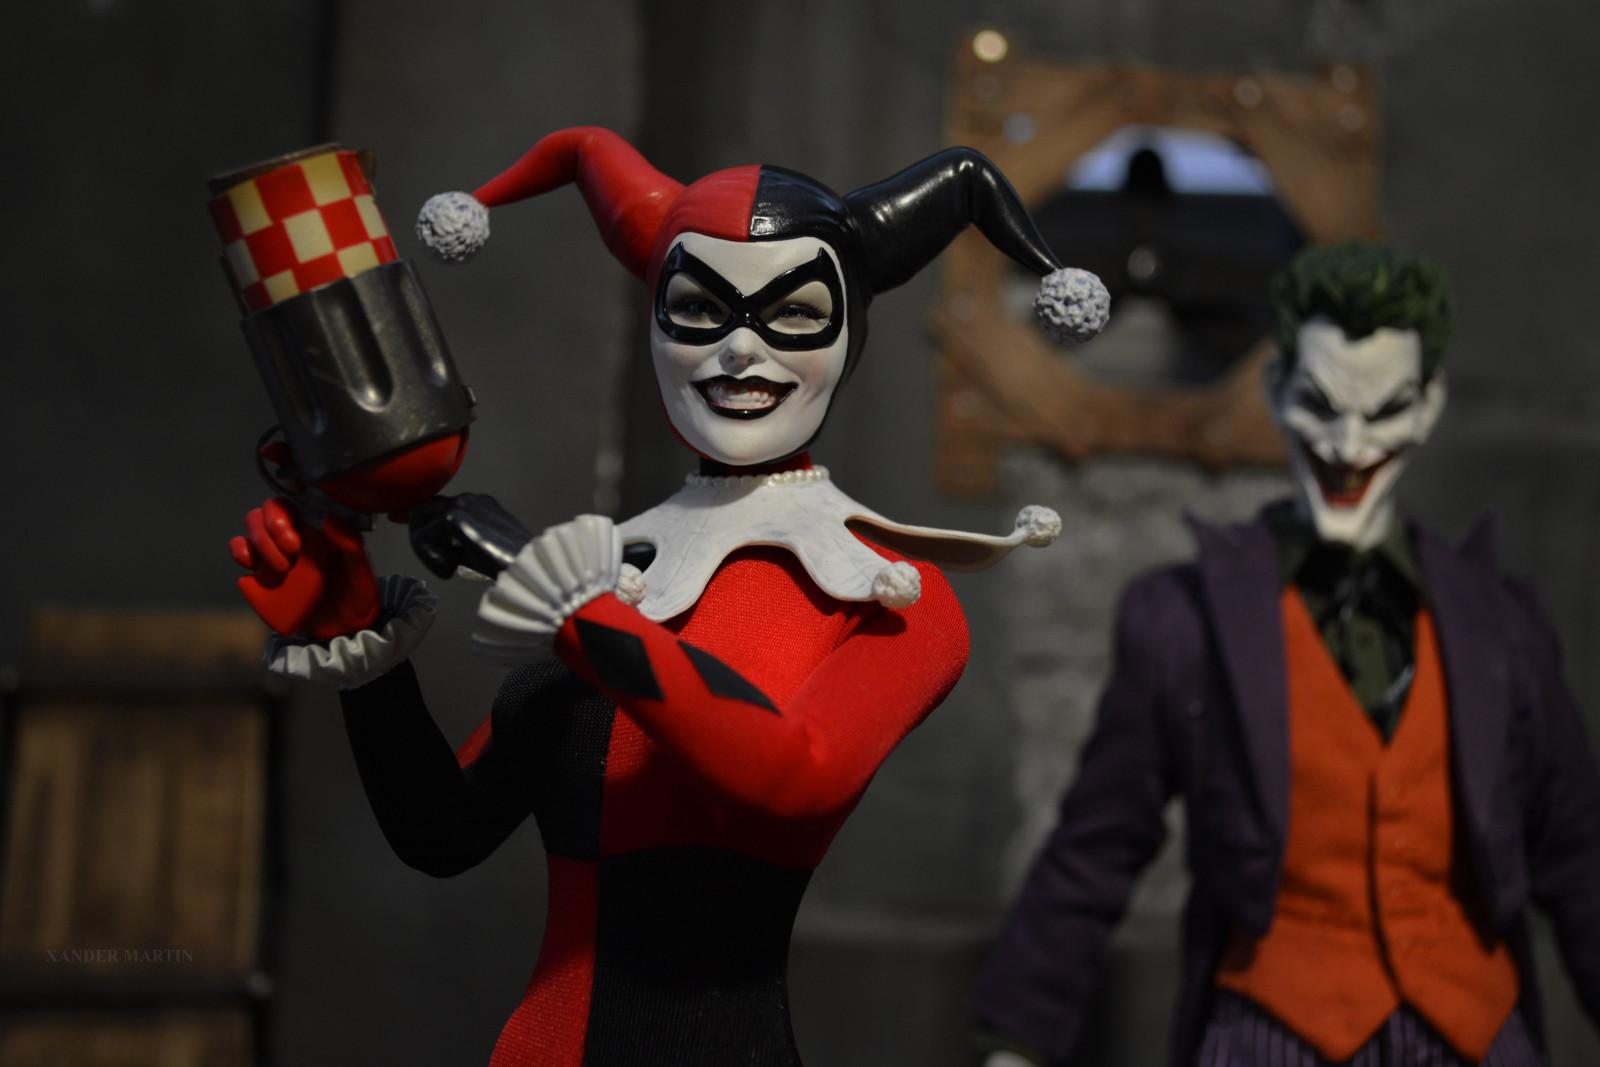 Hintergrundbilder : Batman, Joker, Brauch, Rahmen, Zahl, Robin ...